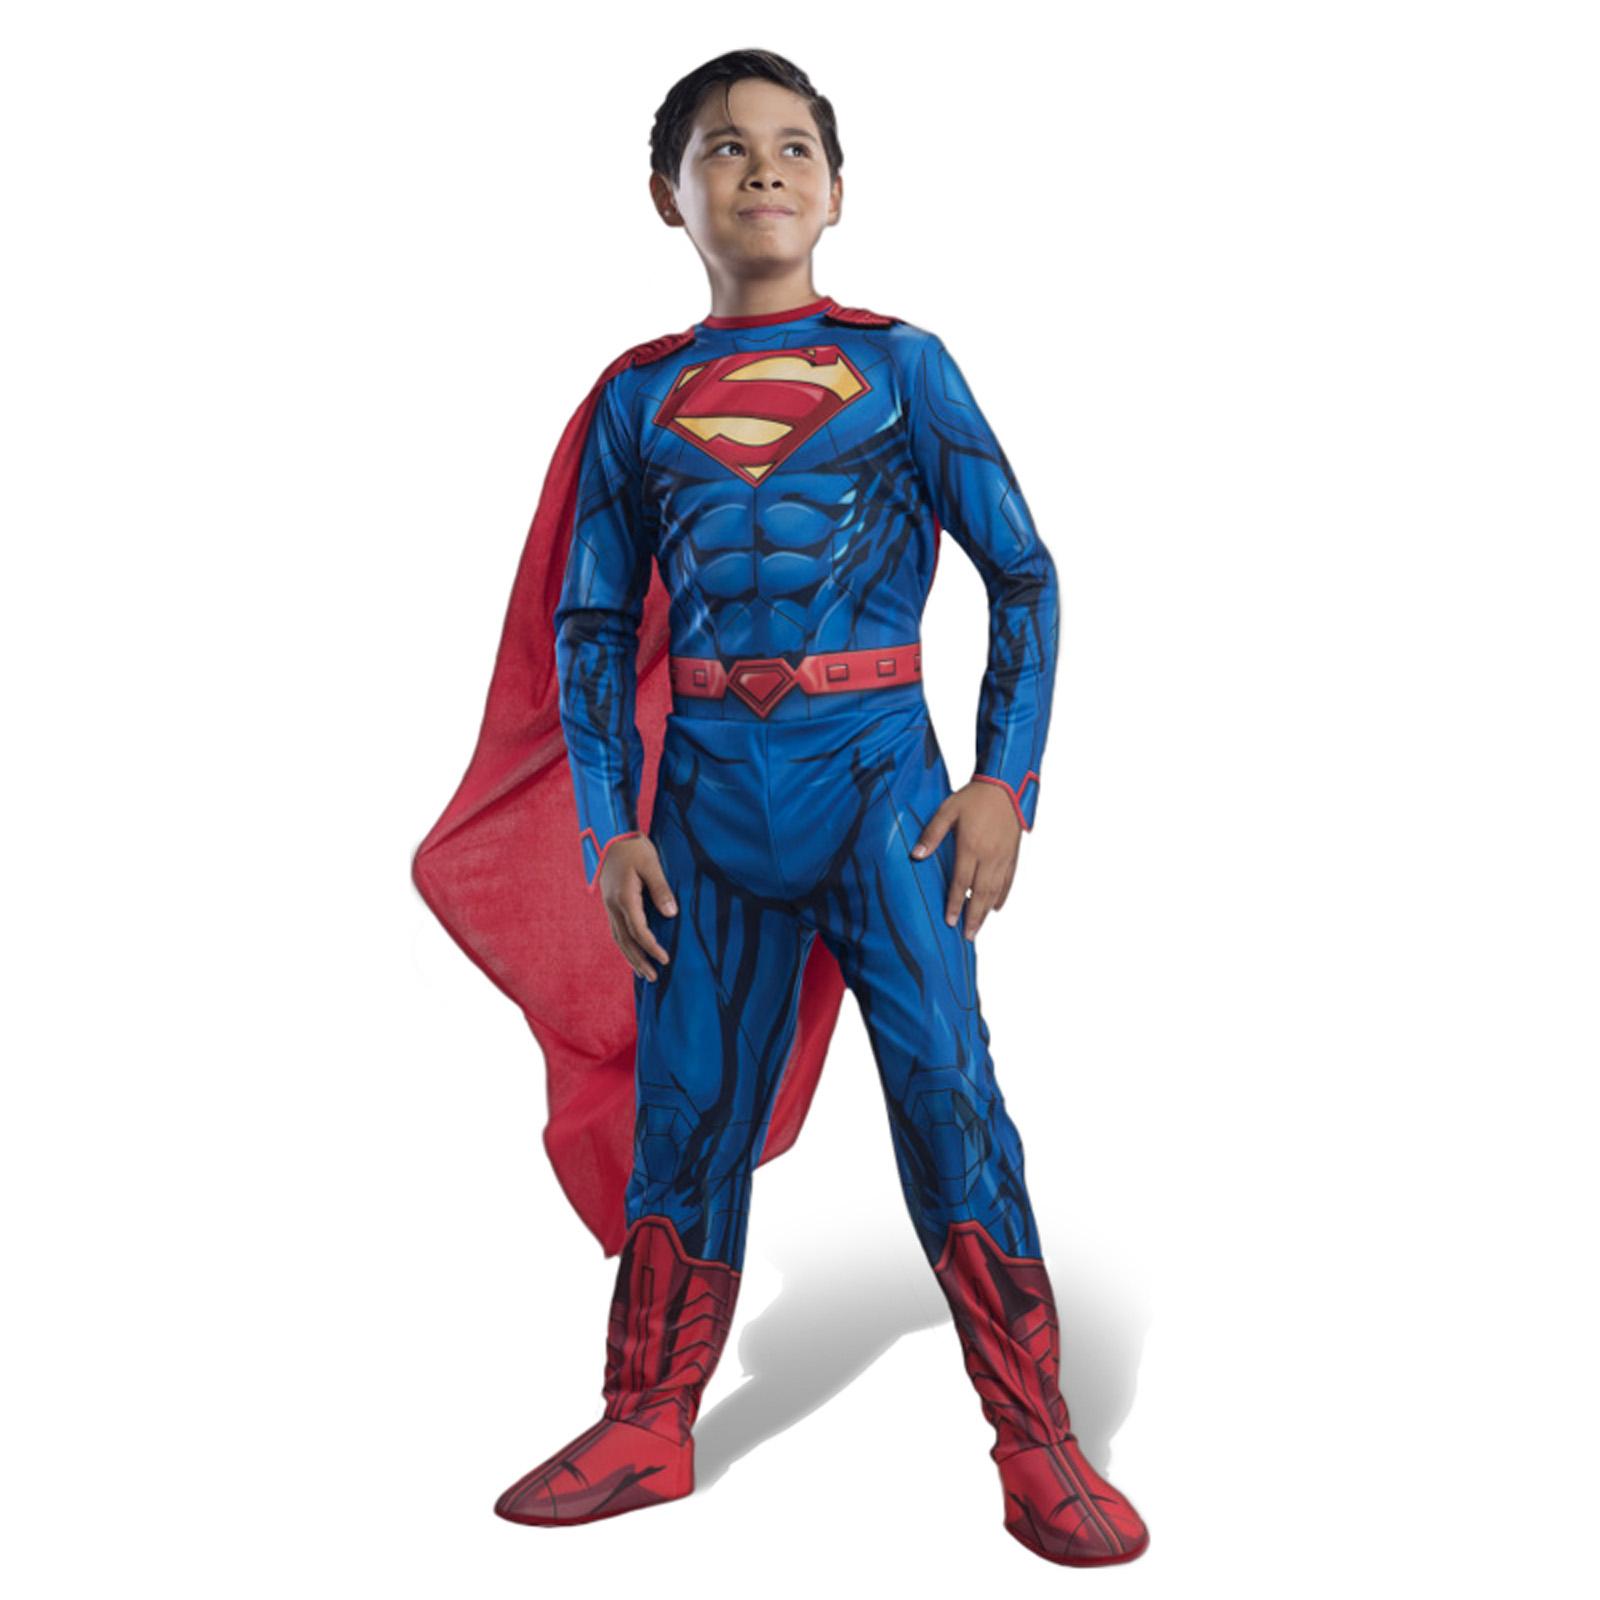 Superman - Overall Kinder Kostüm